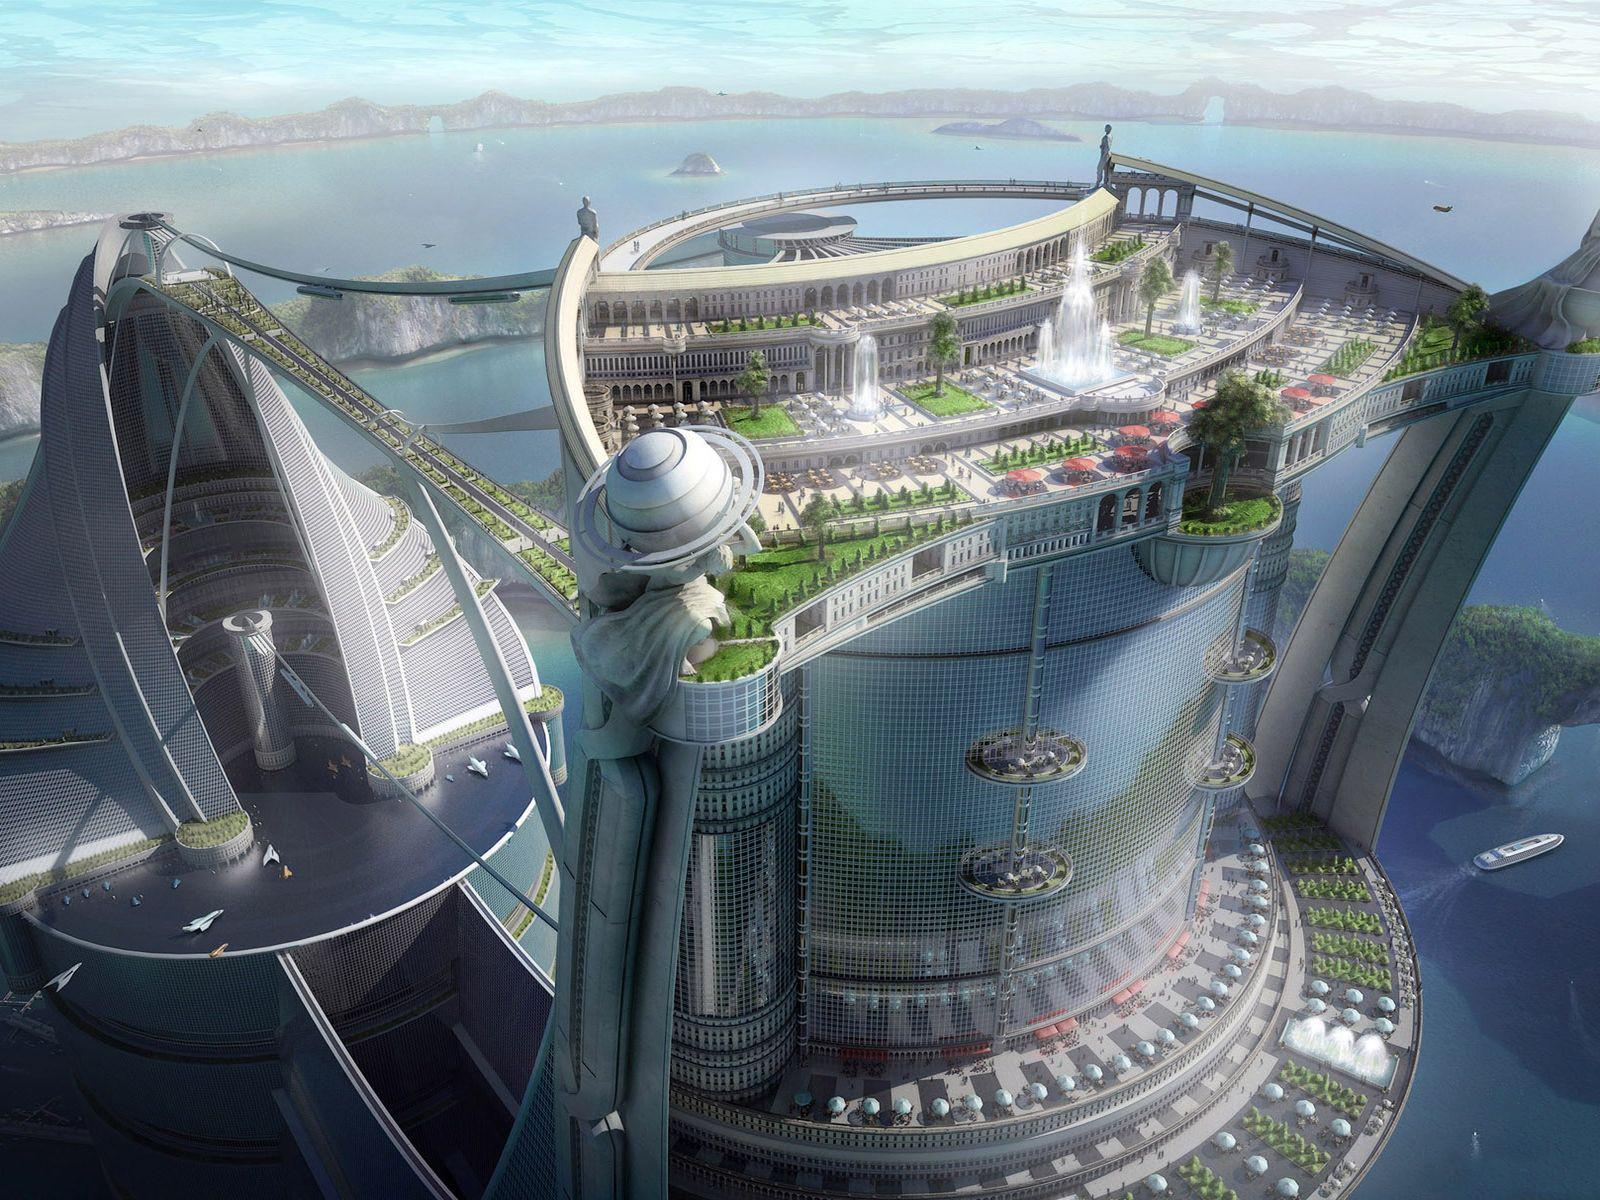 a utopian glimpse into a future built on solar power